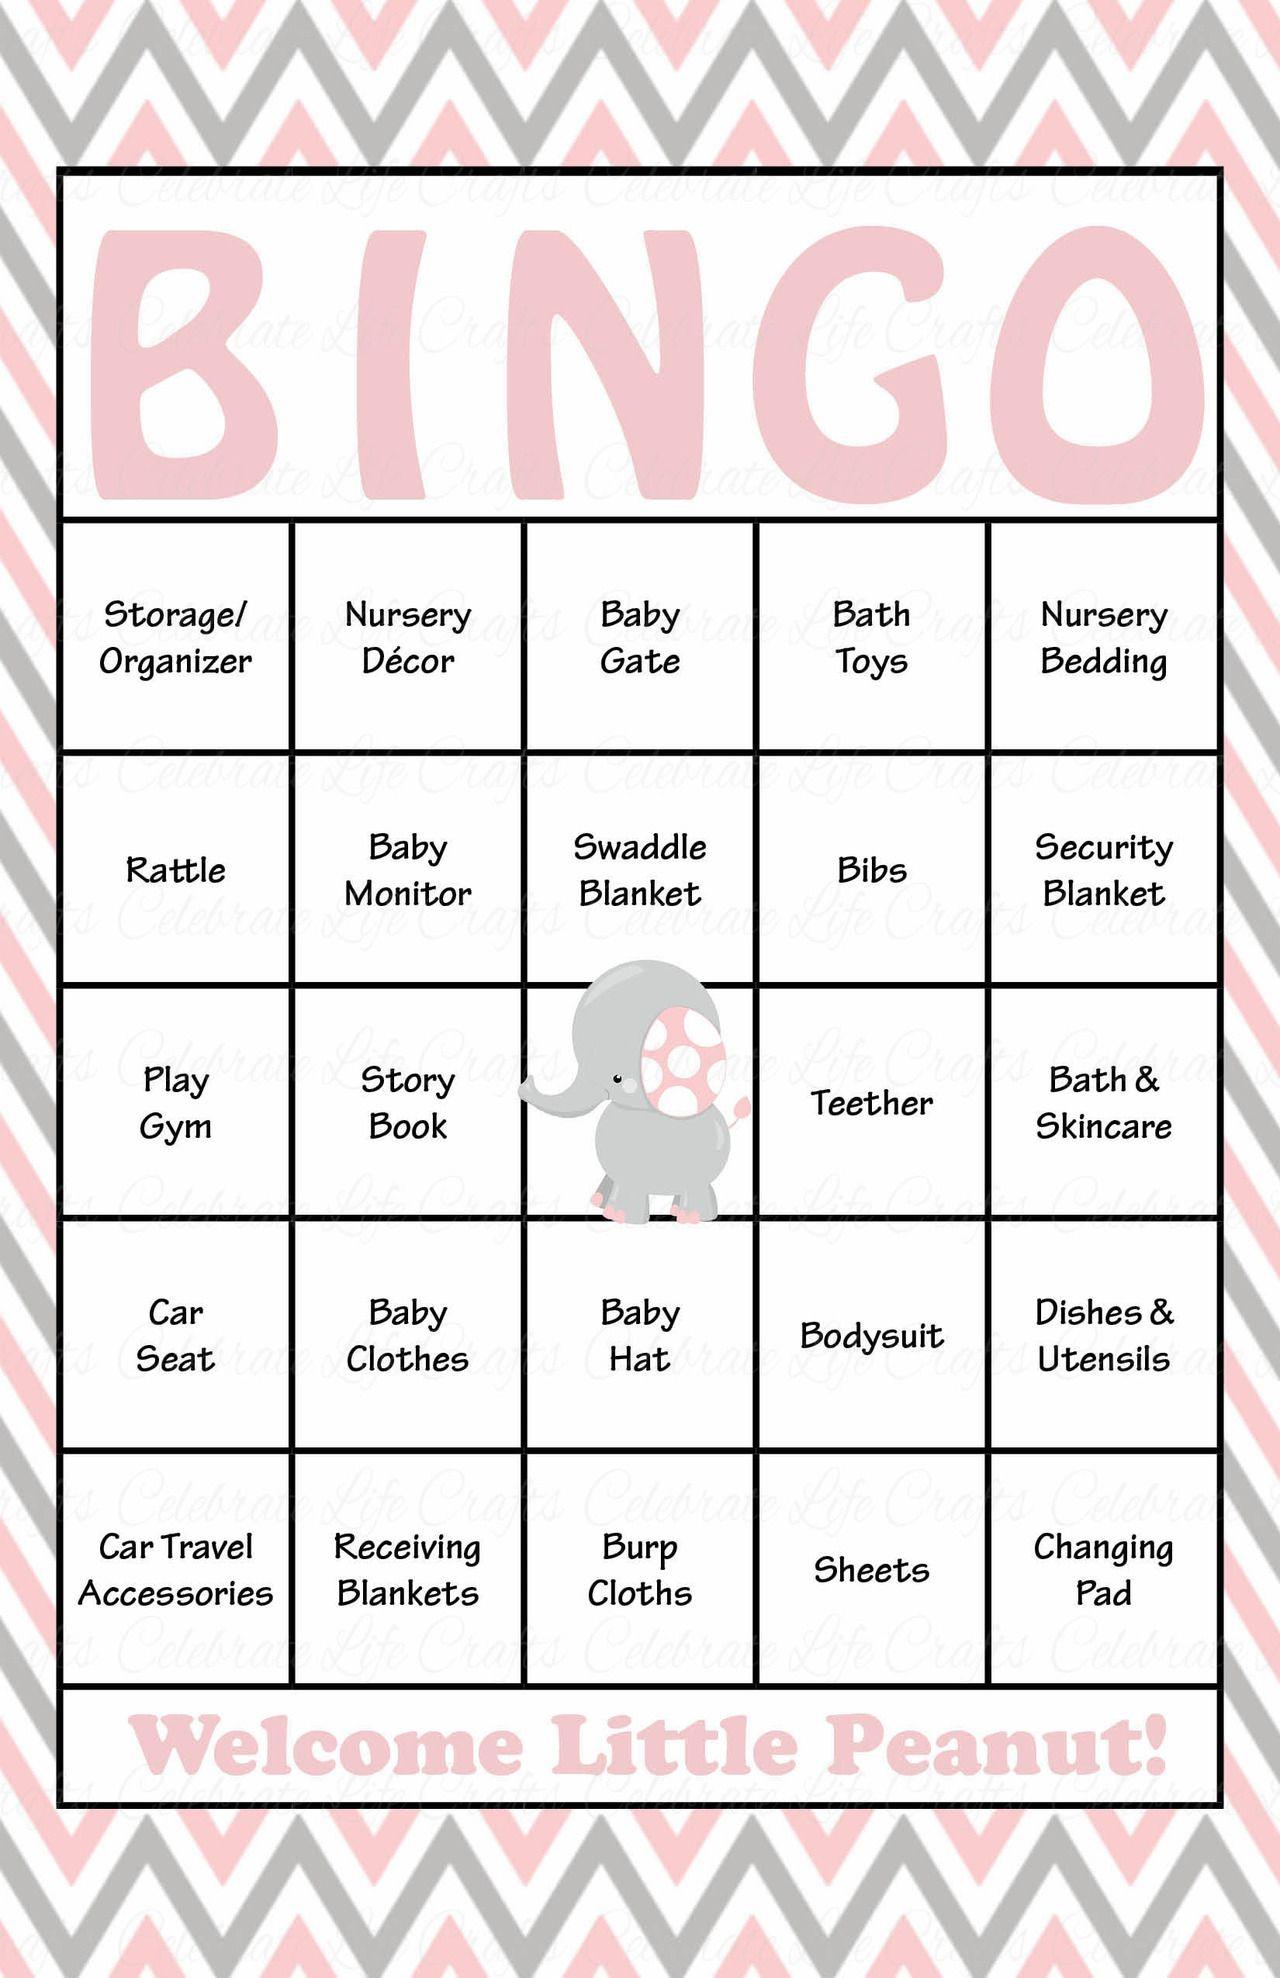 Elephant Baby Shower - Baby Bingo Cards - Printable Download